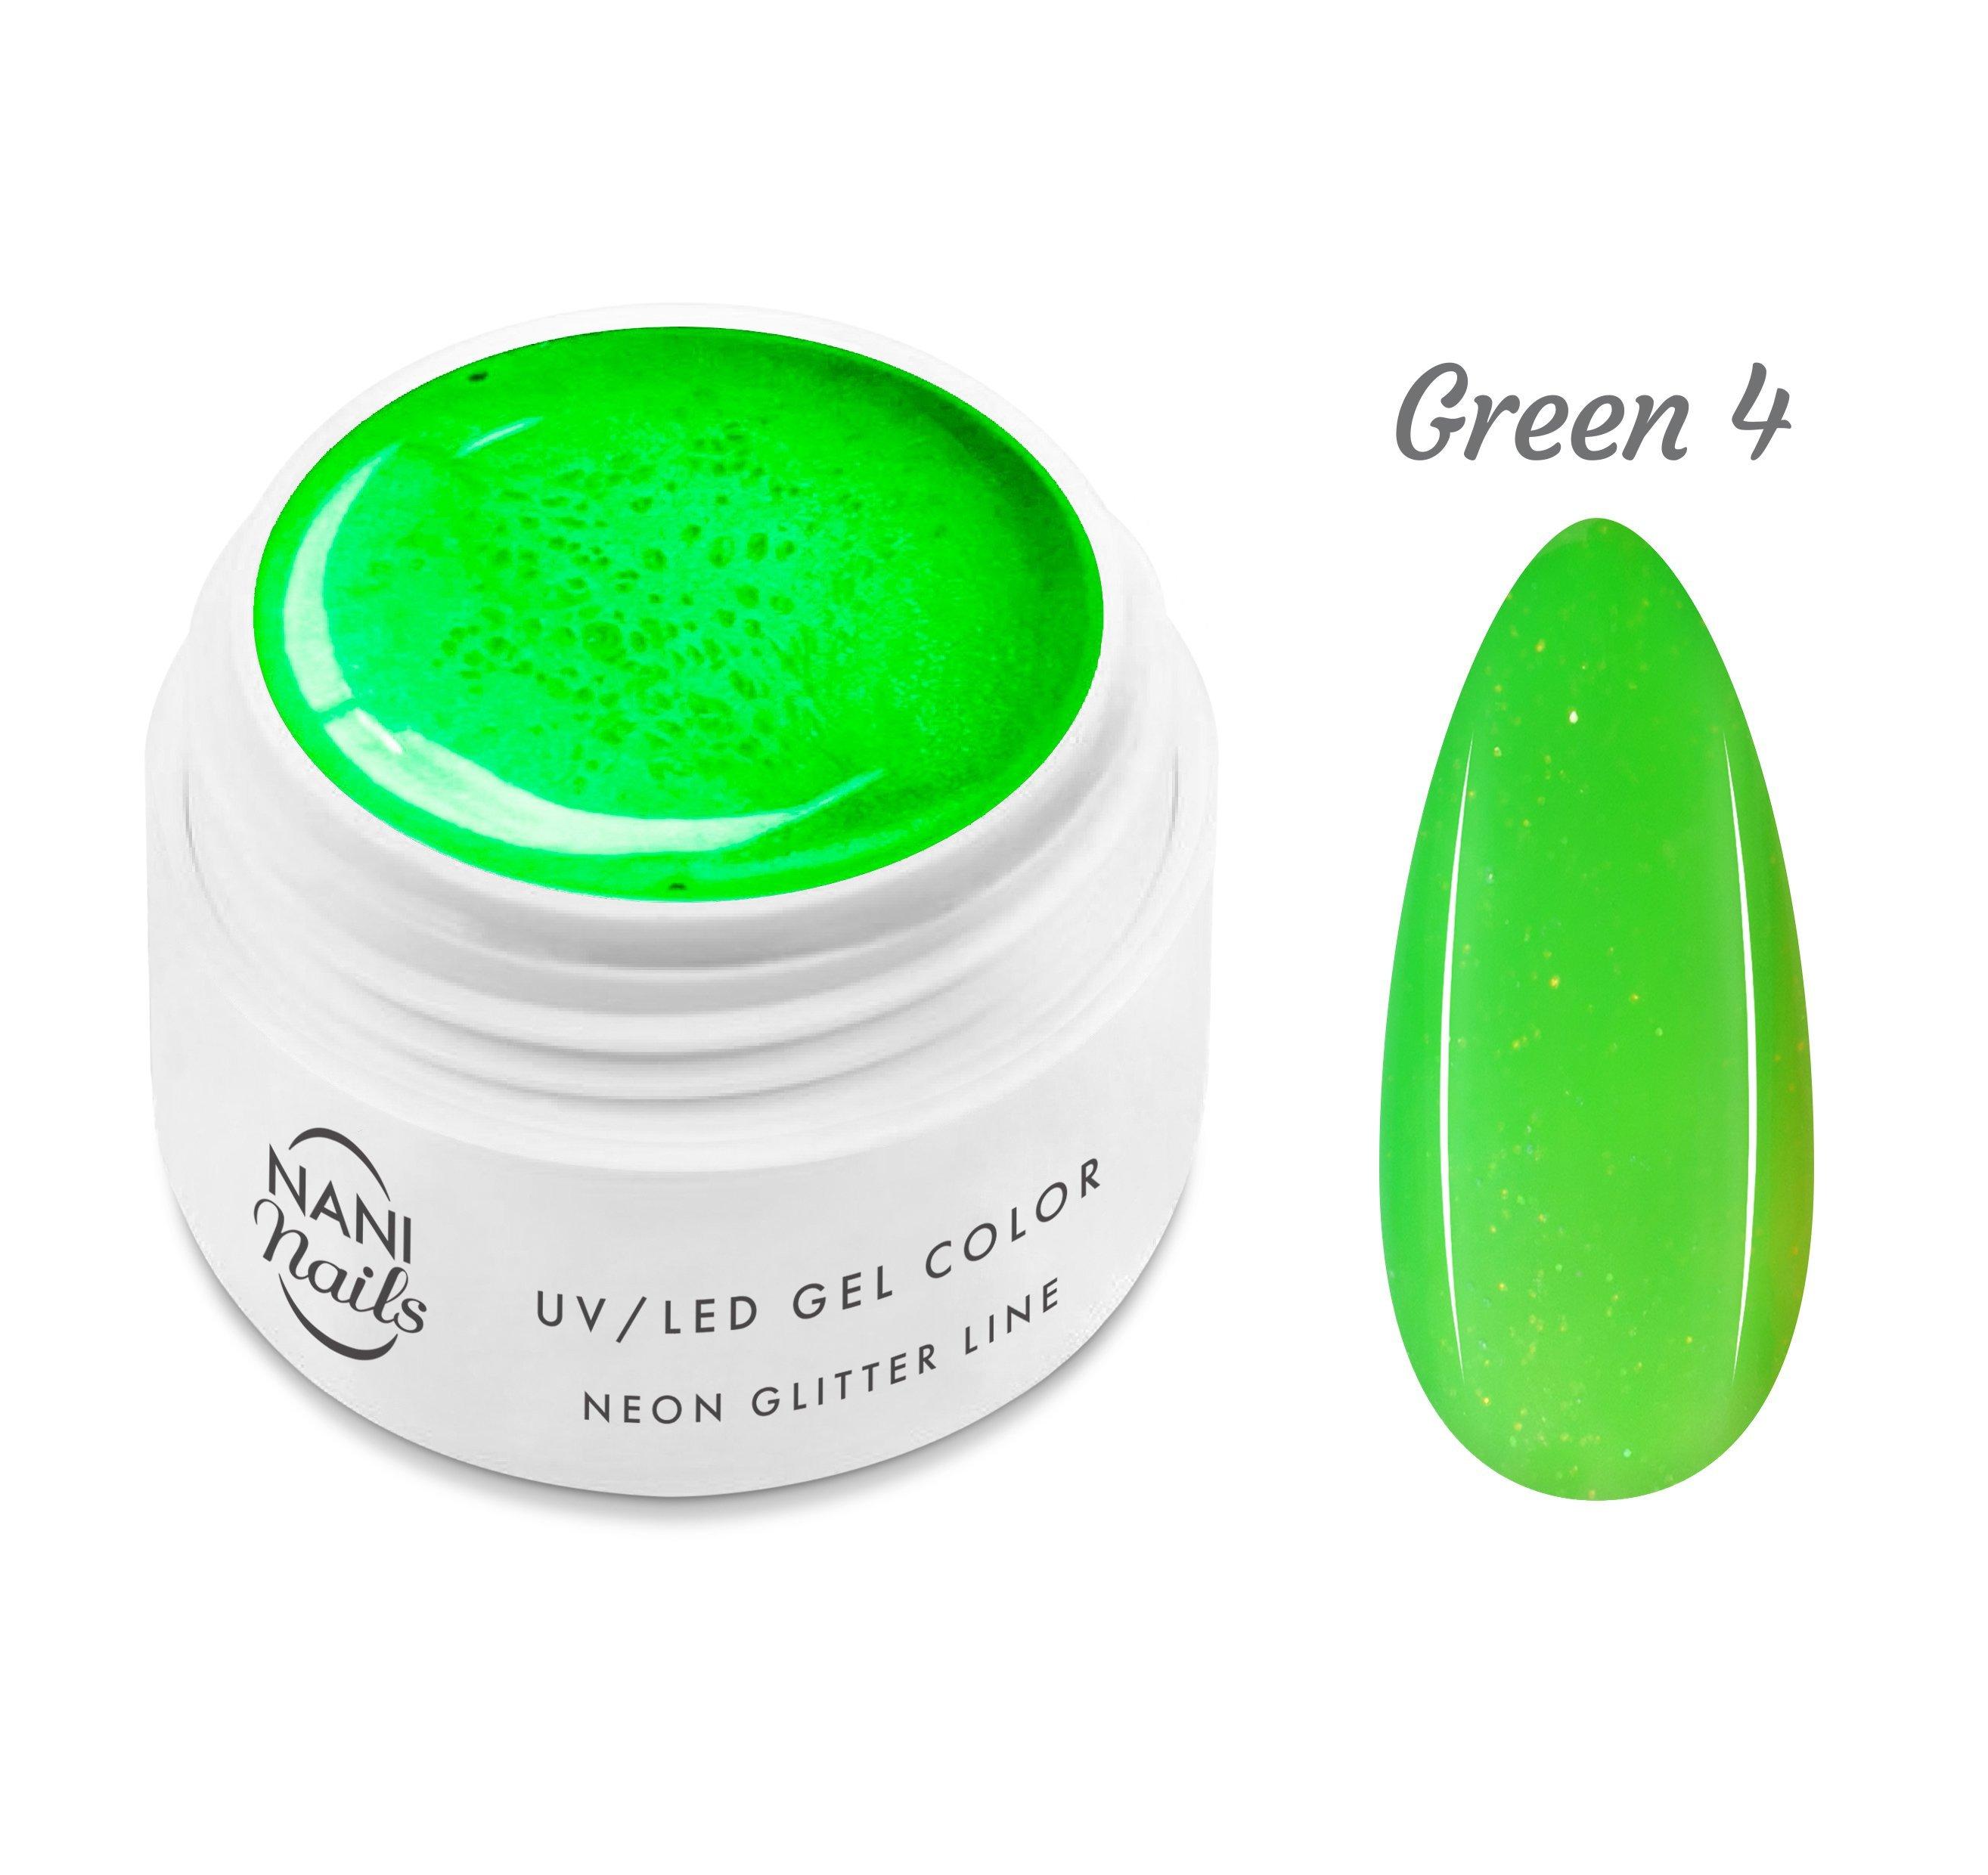 NANI UV gél Neon Glitter Line 5 ml - Green